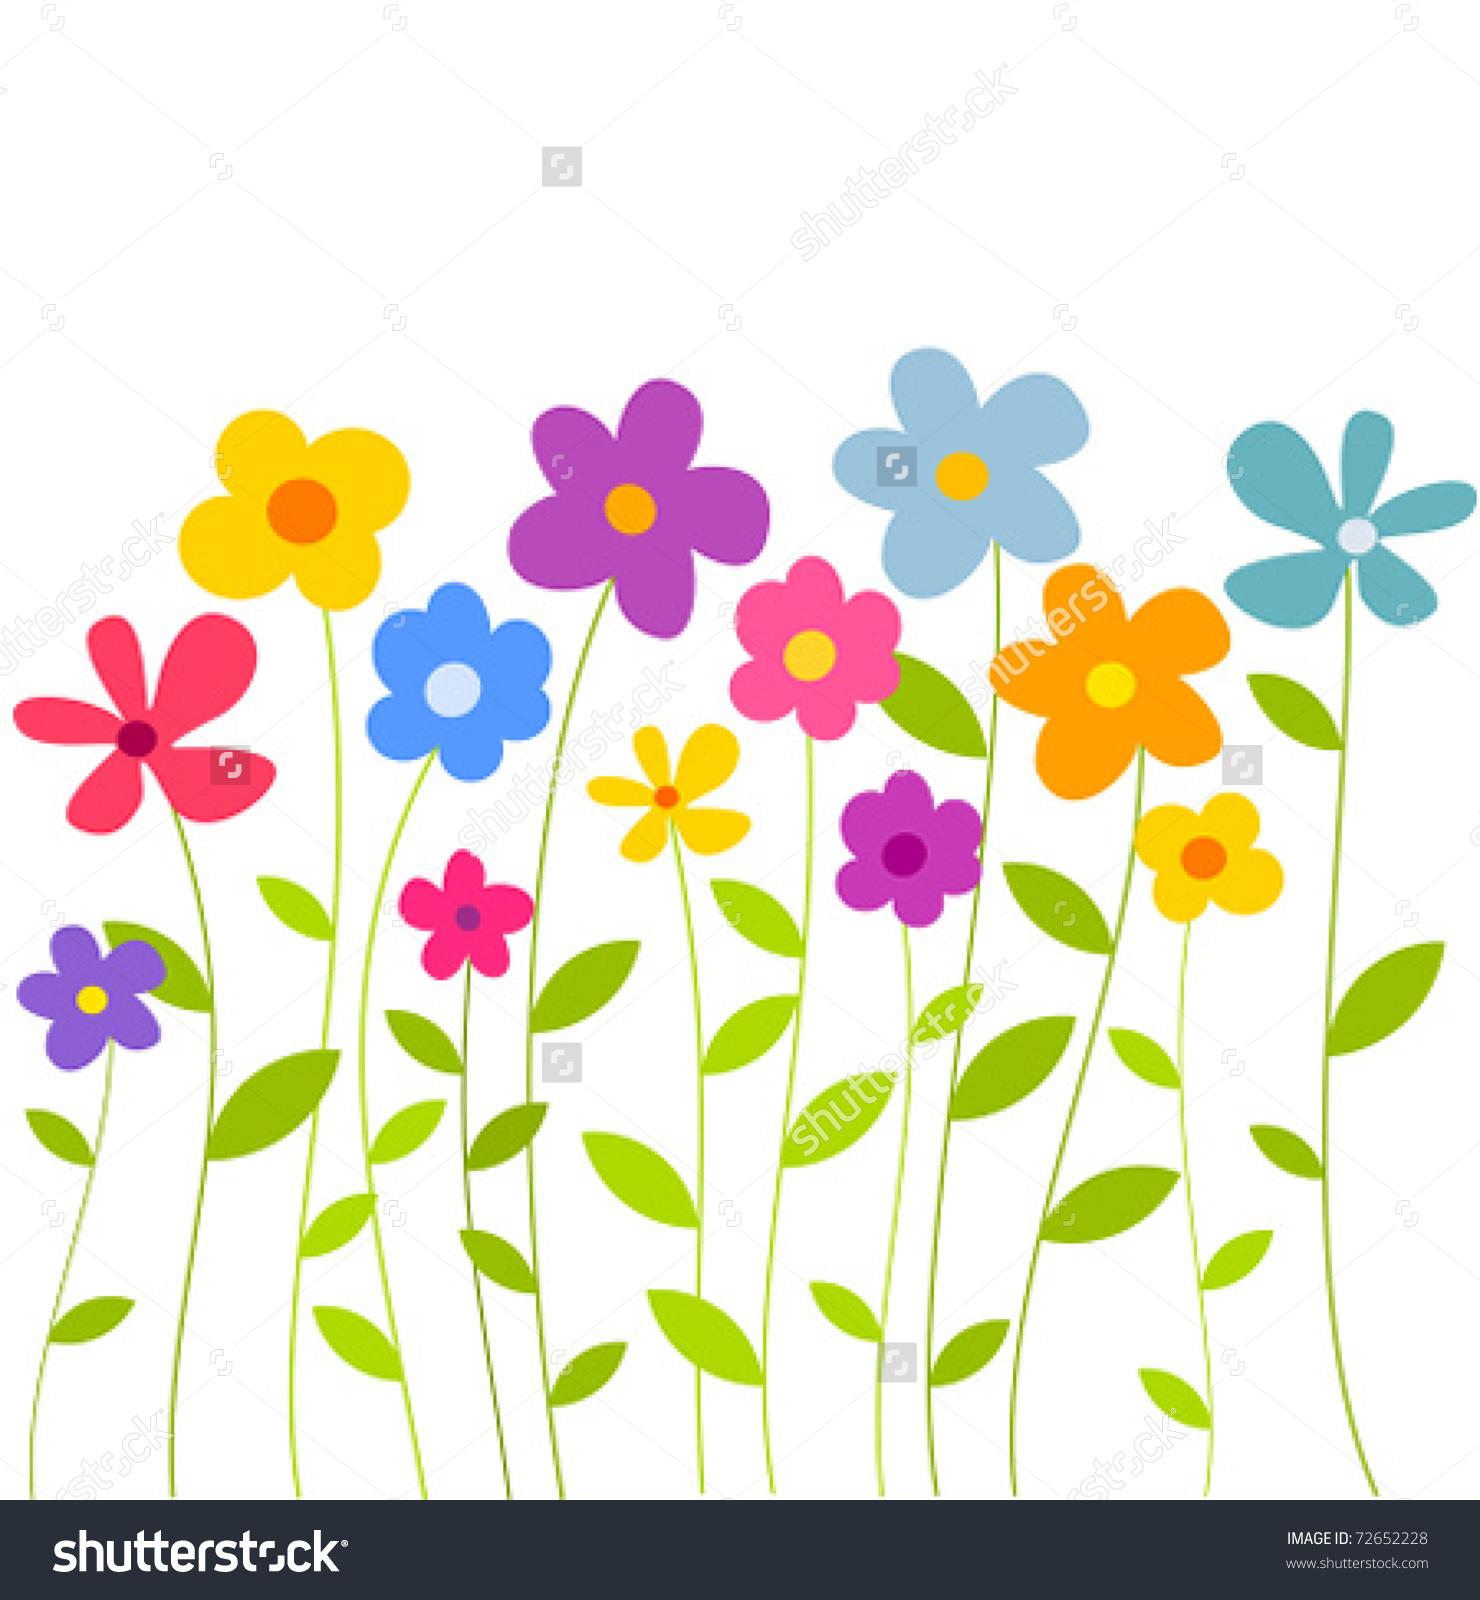 Flowers cartoon choice image. Brunch clipart spring